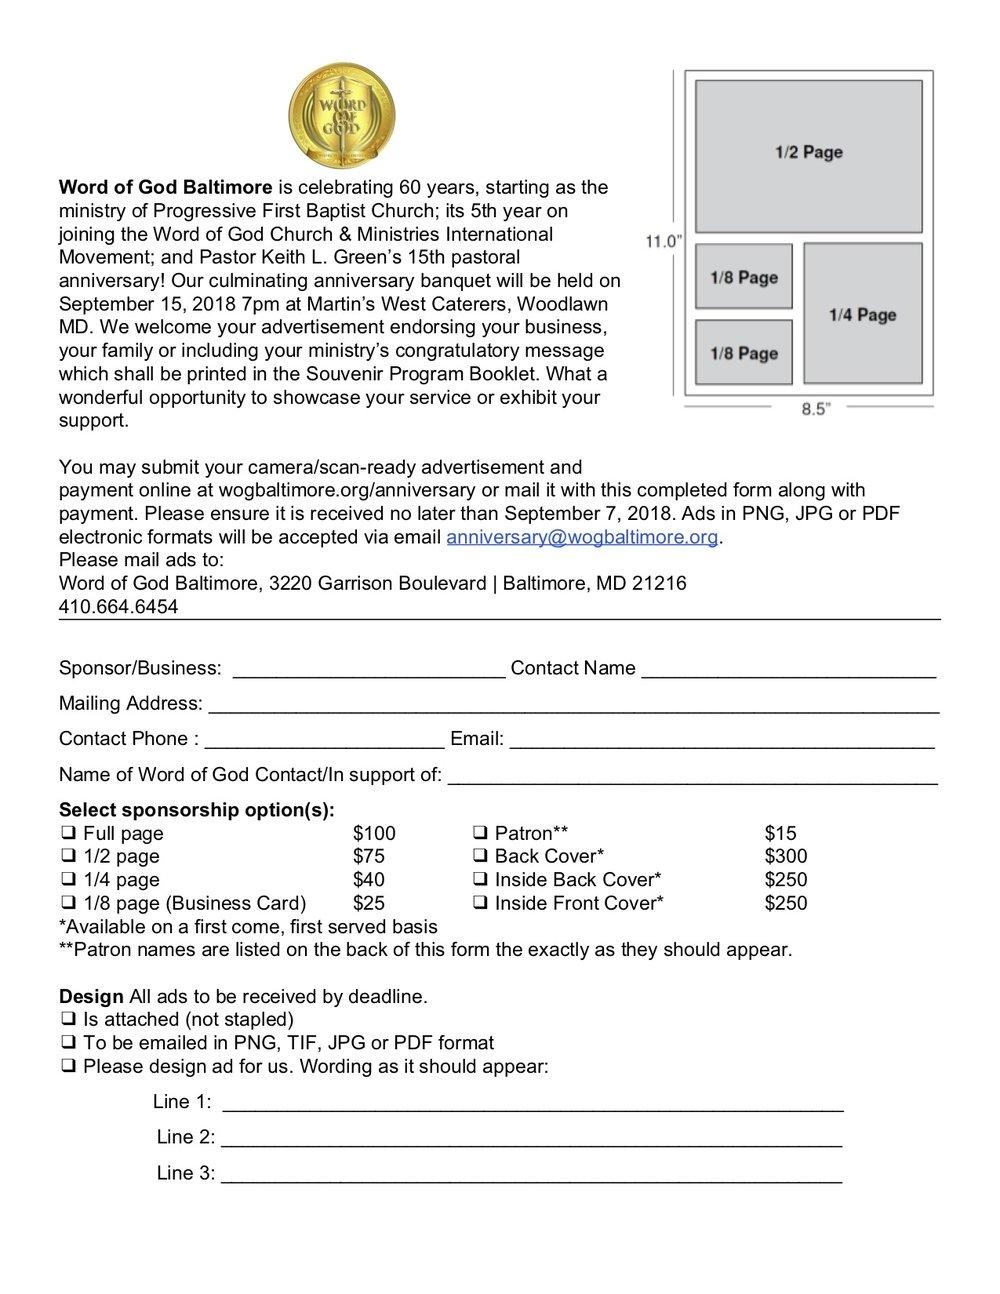 Order online @  wogbaltimore.org/anniversarystore/anniversary-journal-ad